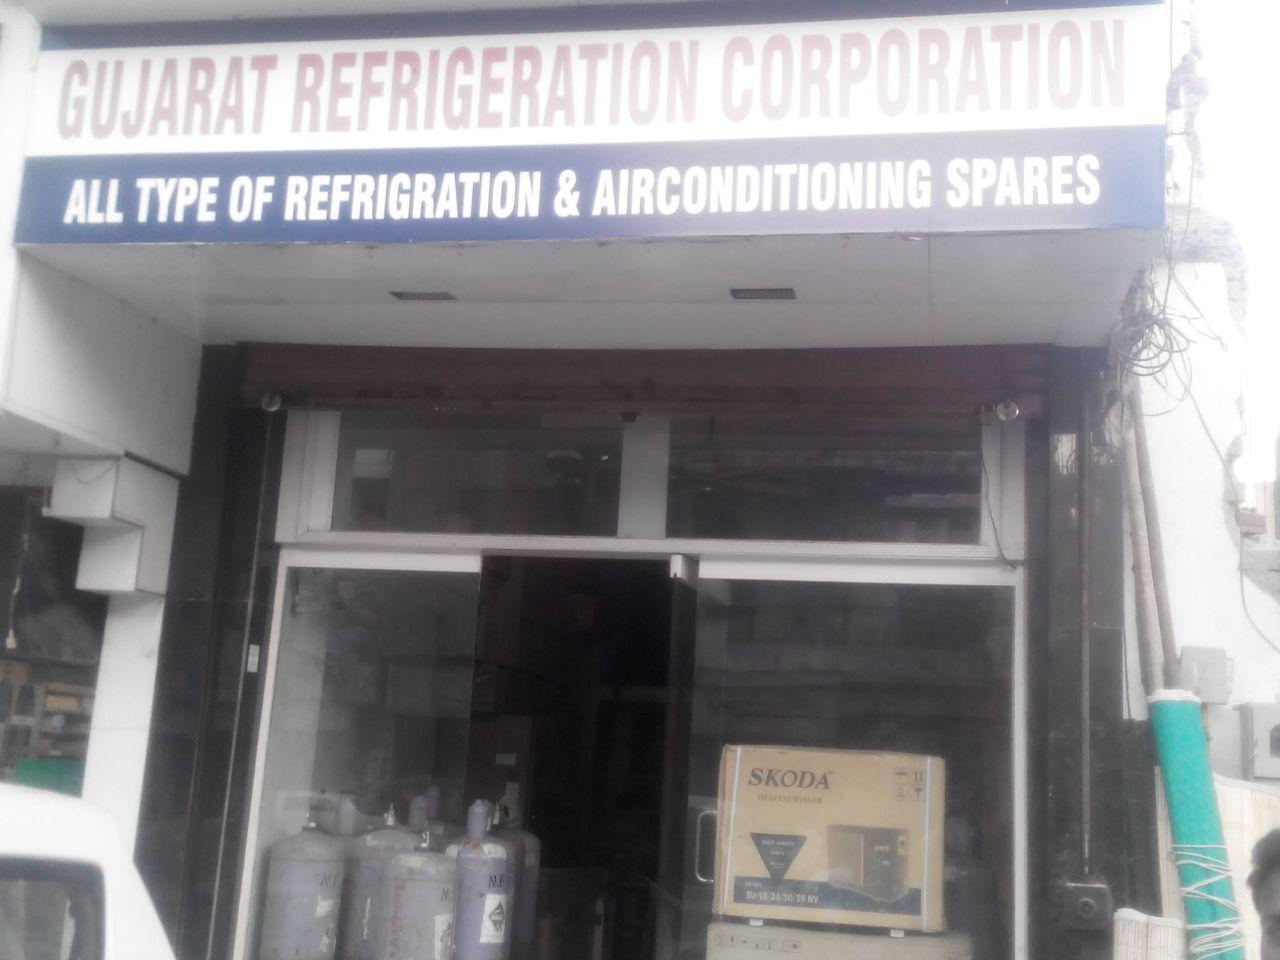 Gujarat Refrigeration Corporation